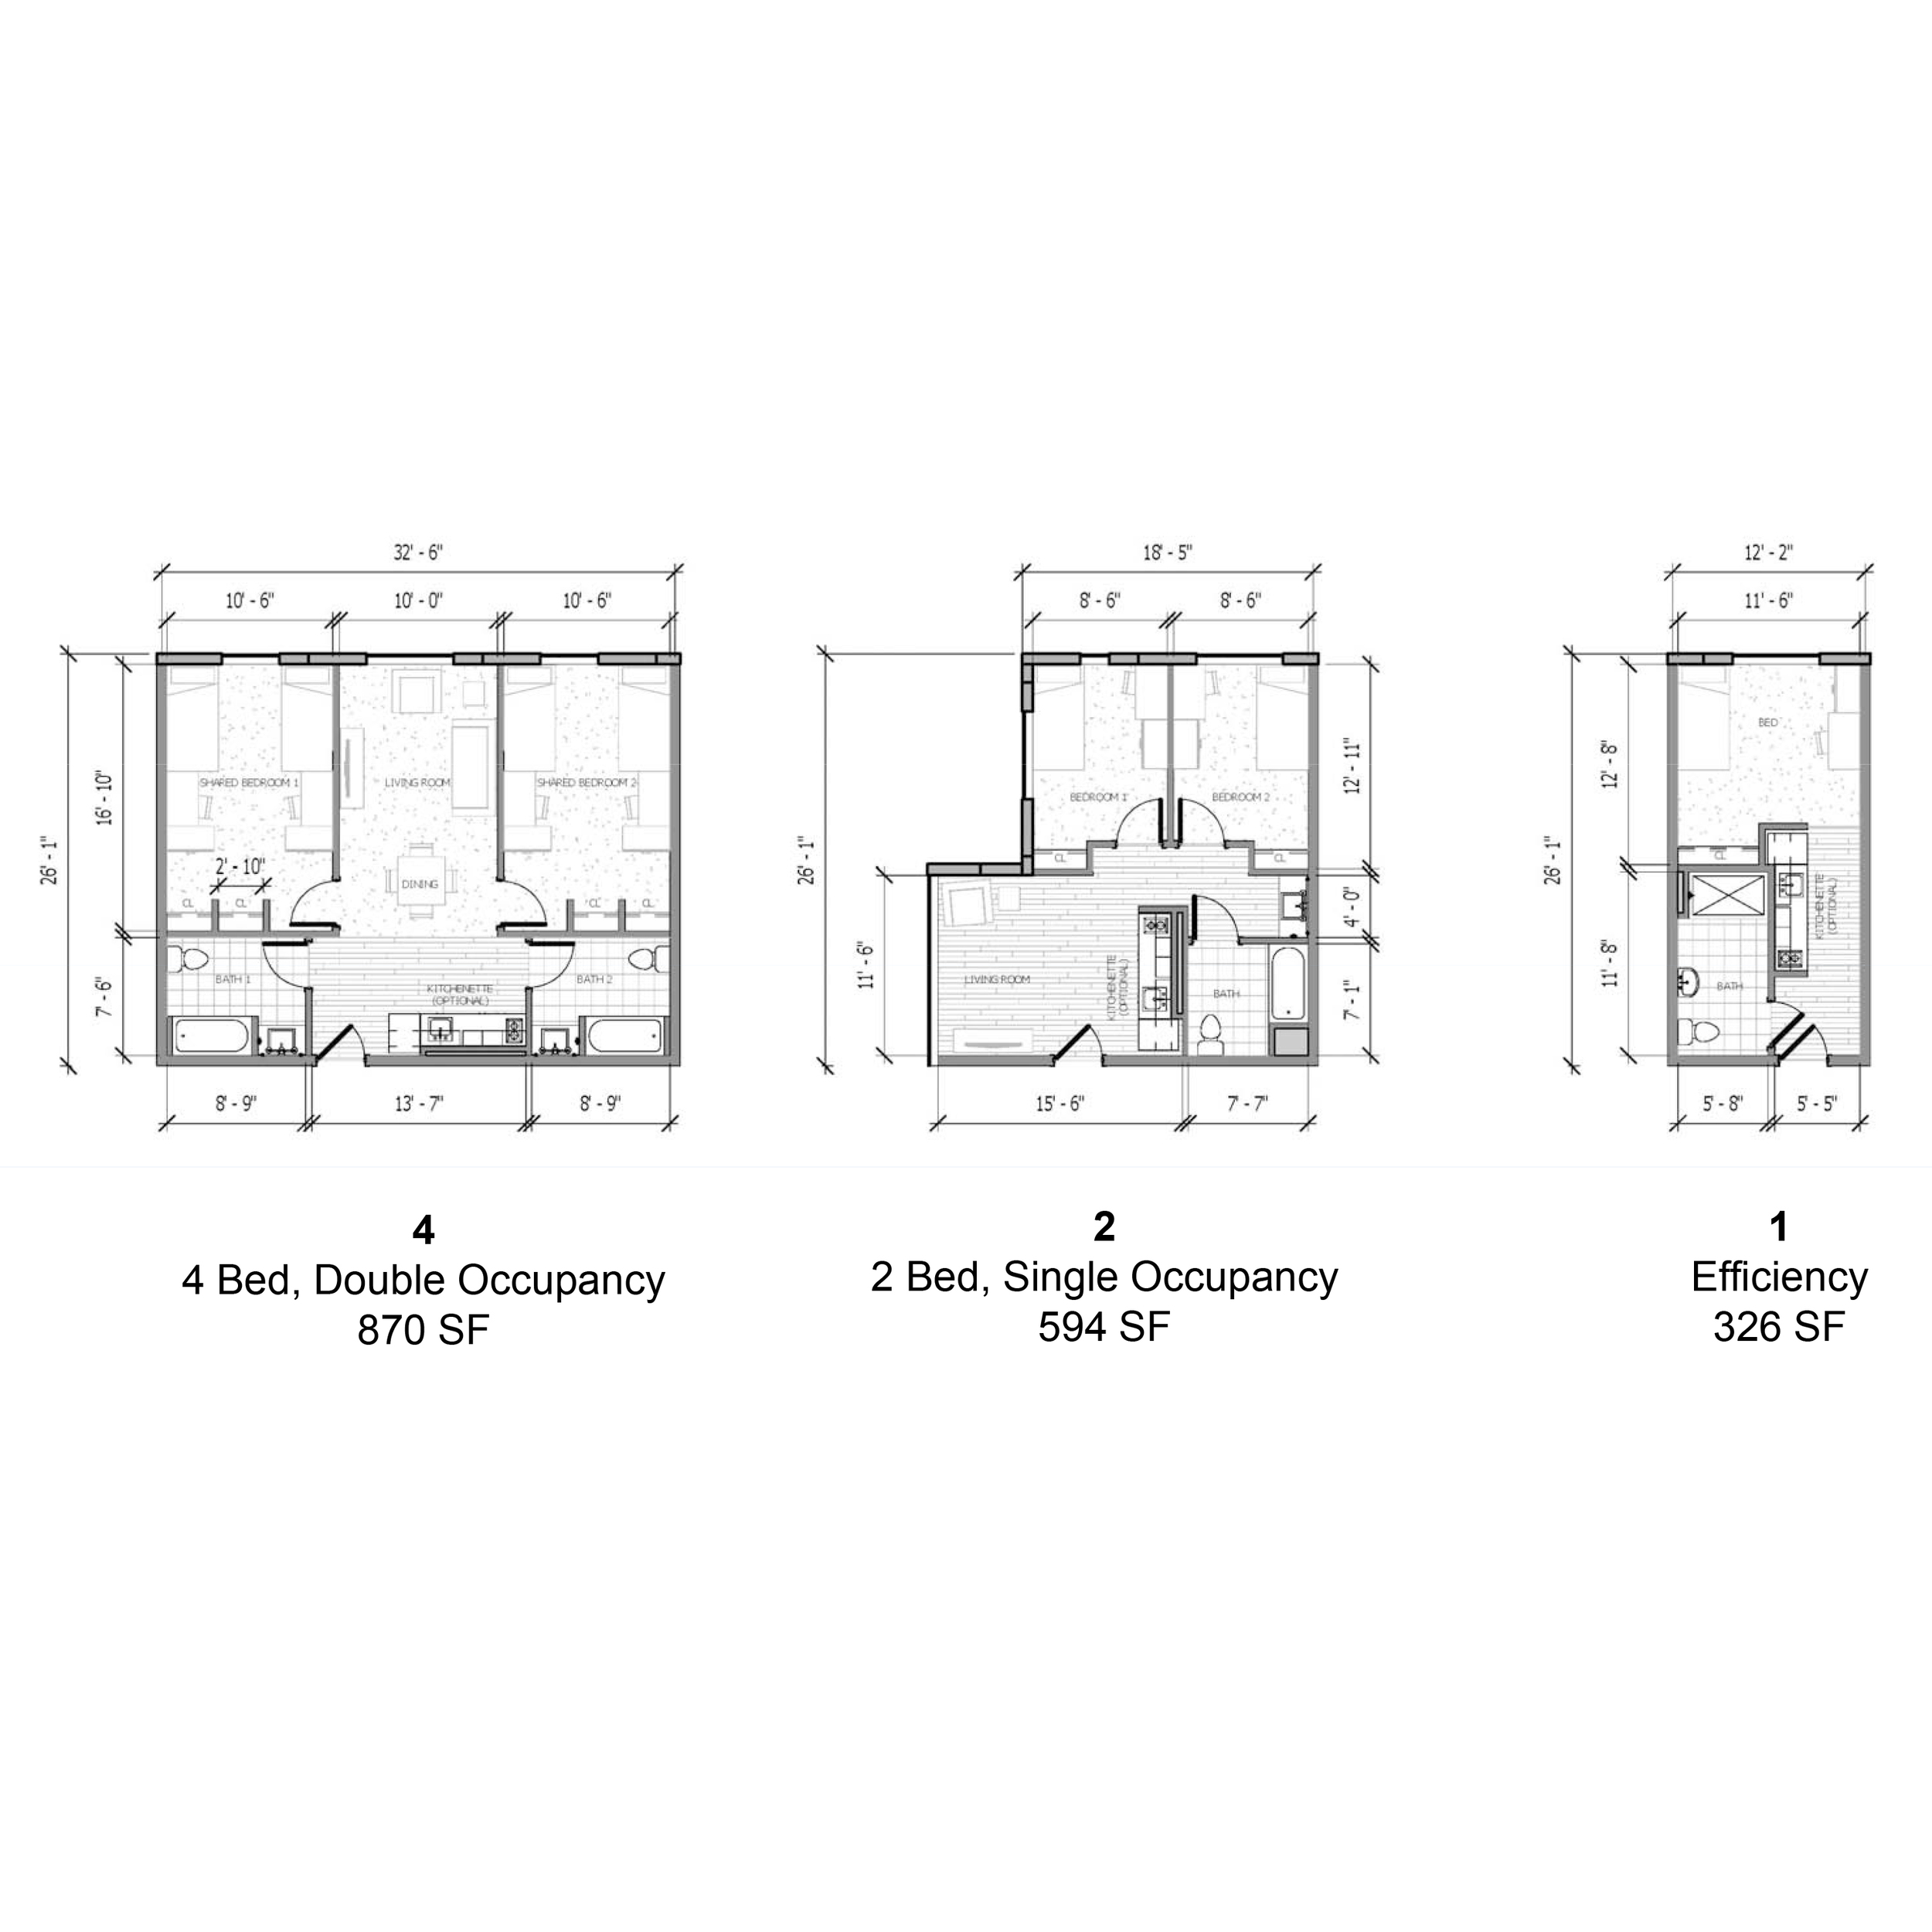 for design proposal (Stevens Institute of Technology)